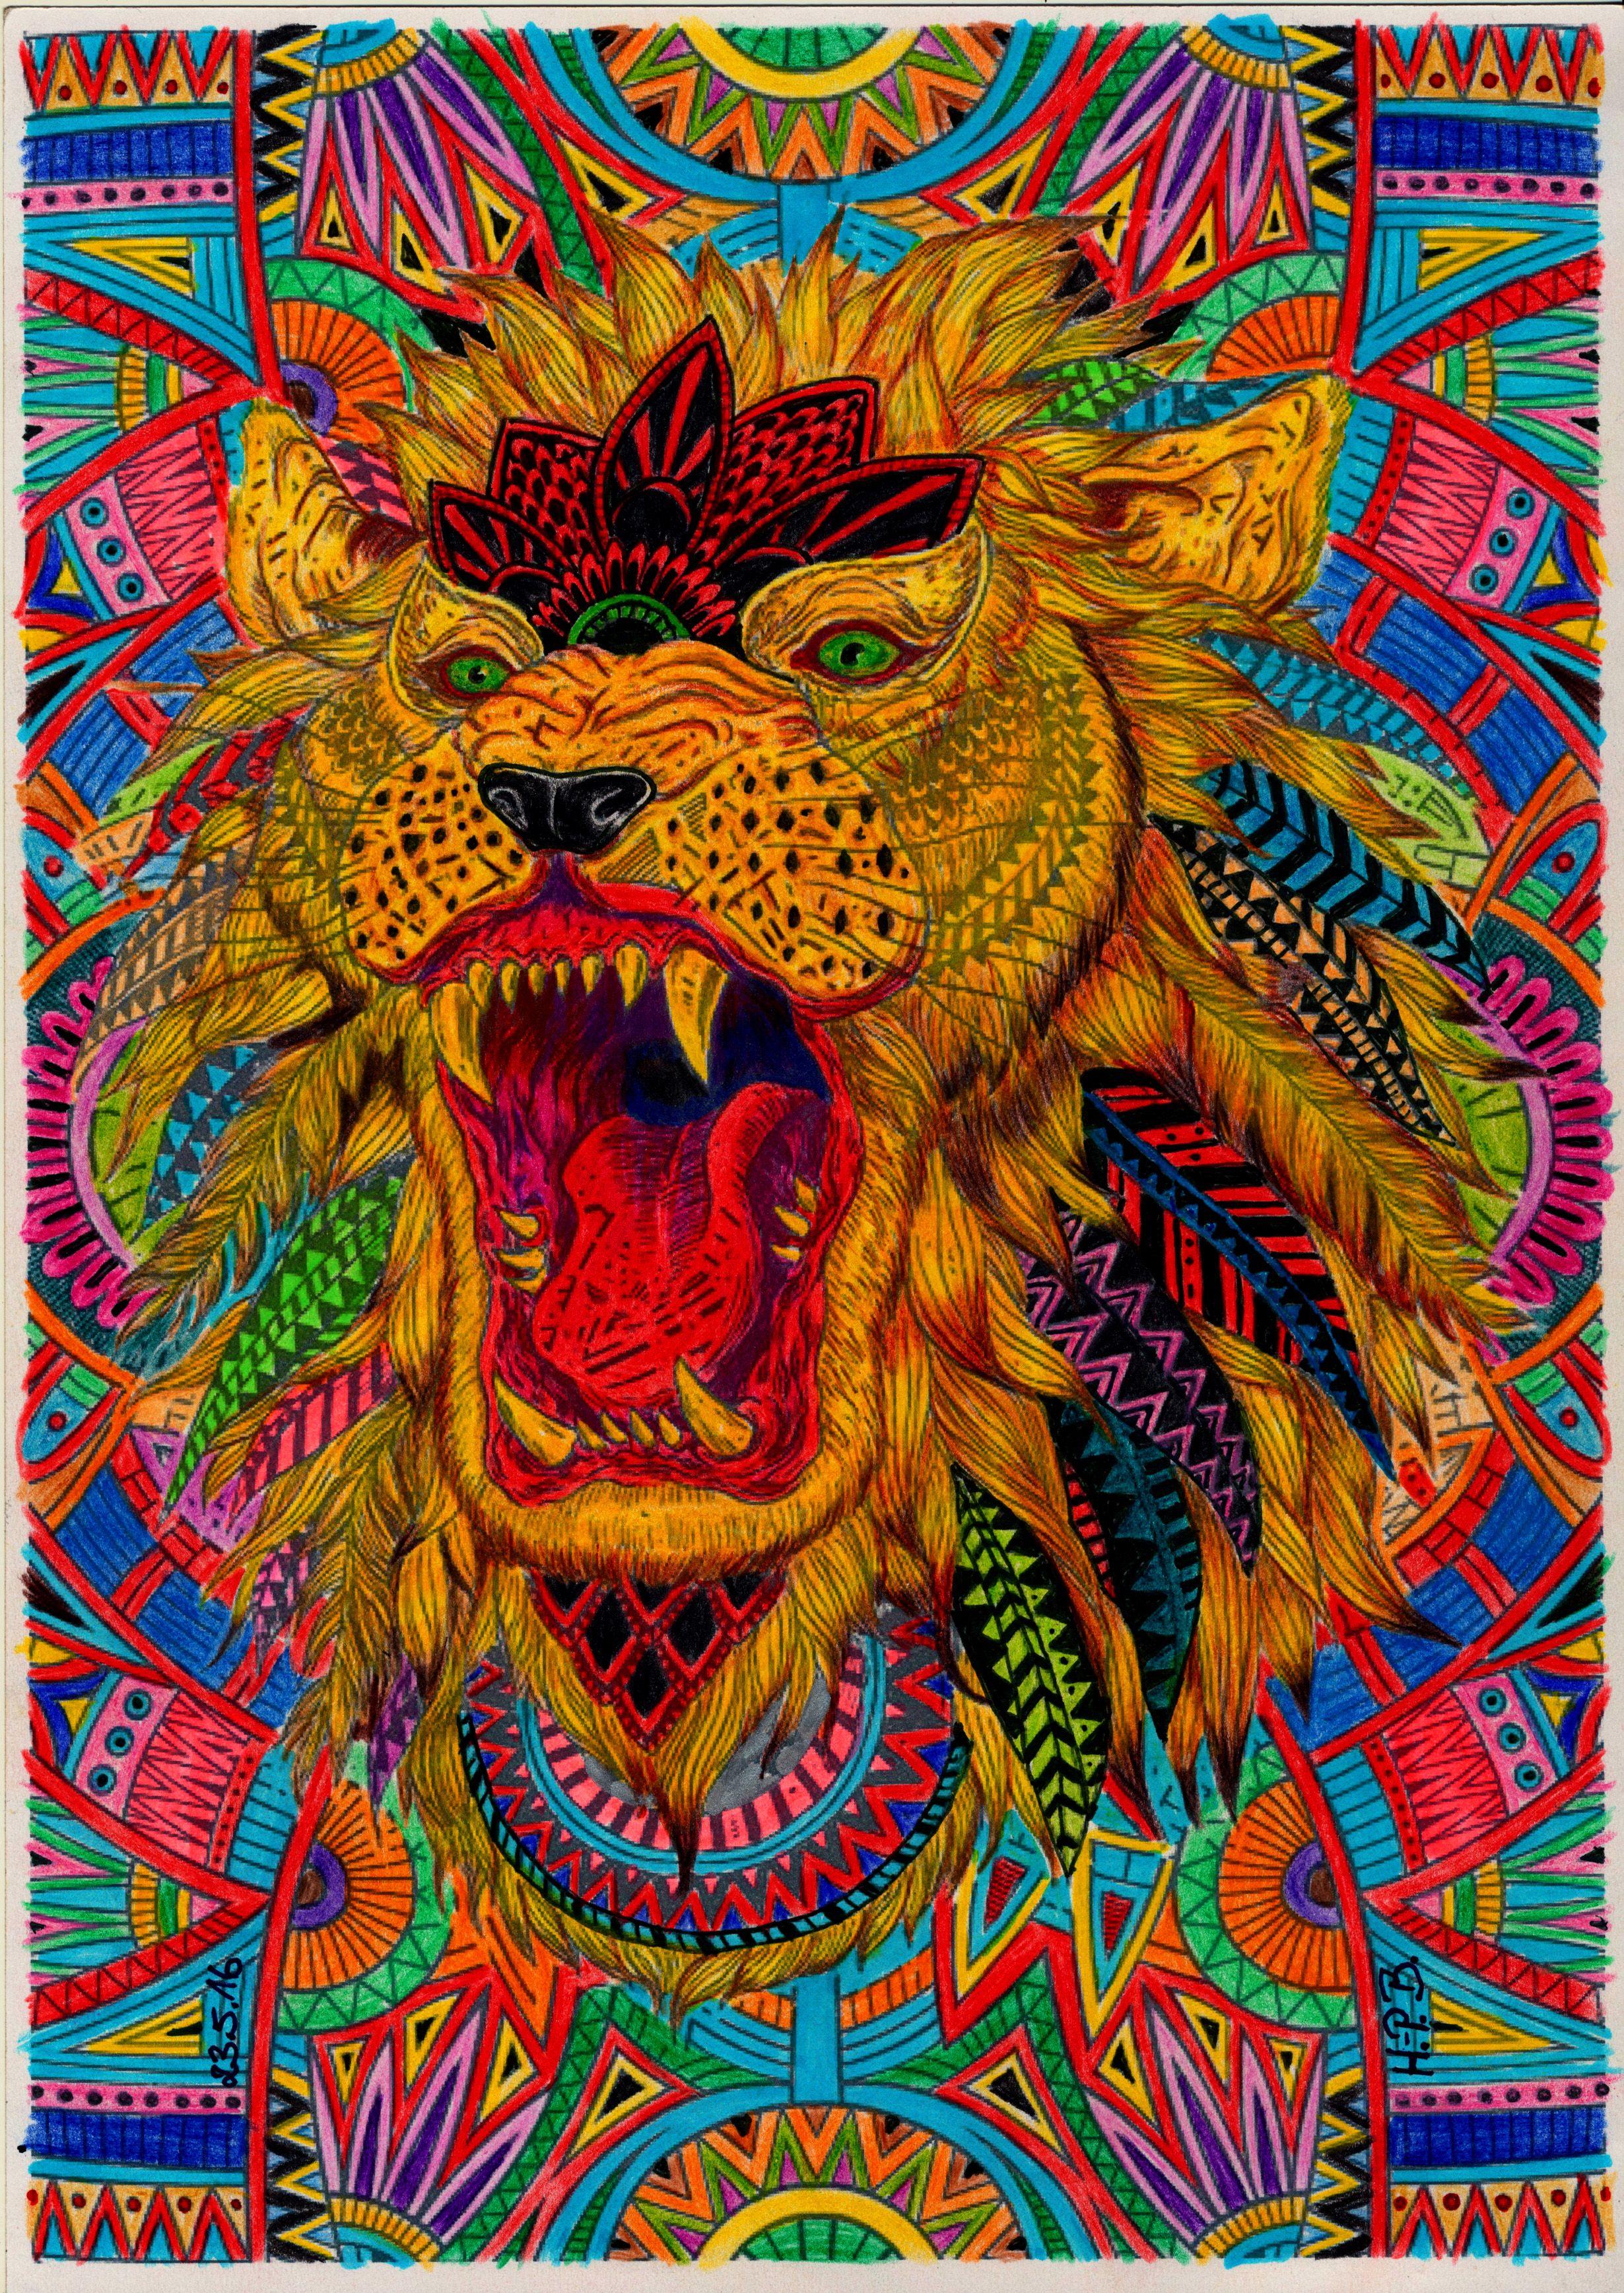 Myherbcoil Art Phdlc In 2018 Pinterest Psychedelic De La Pgina Cesar Flores On Gfci Internal Wiring Diagram